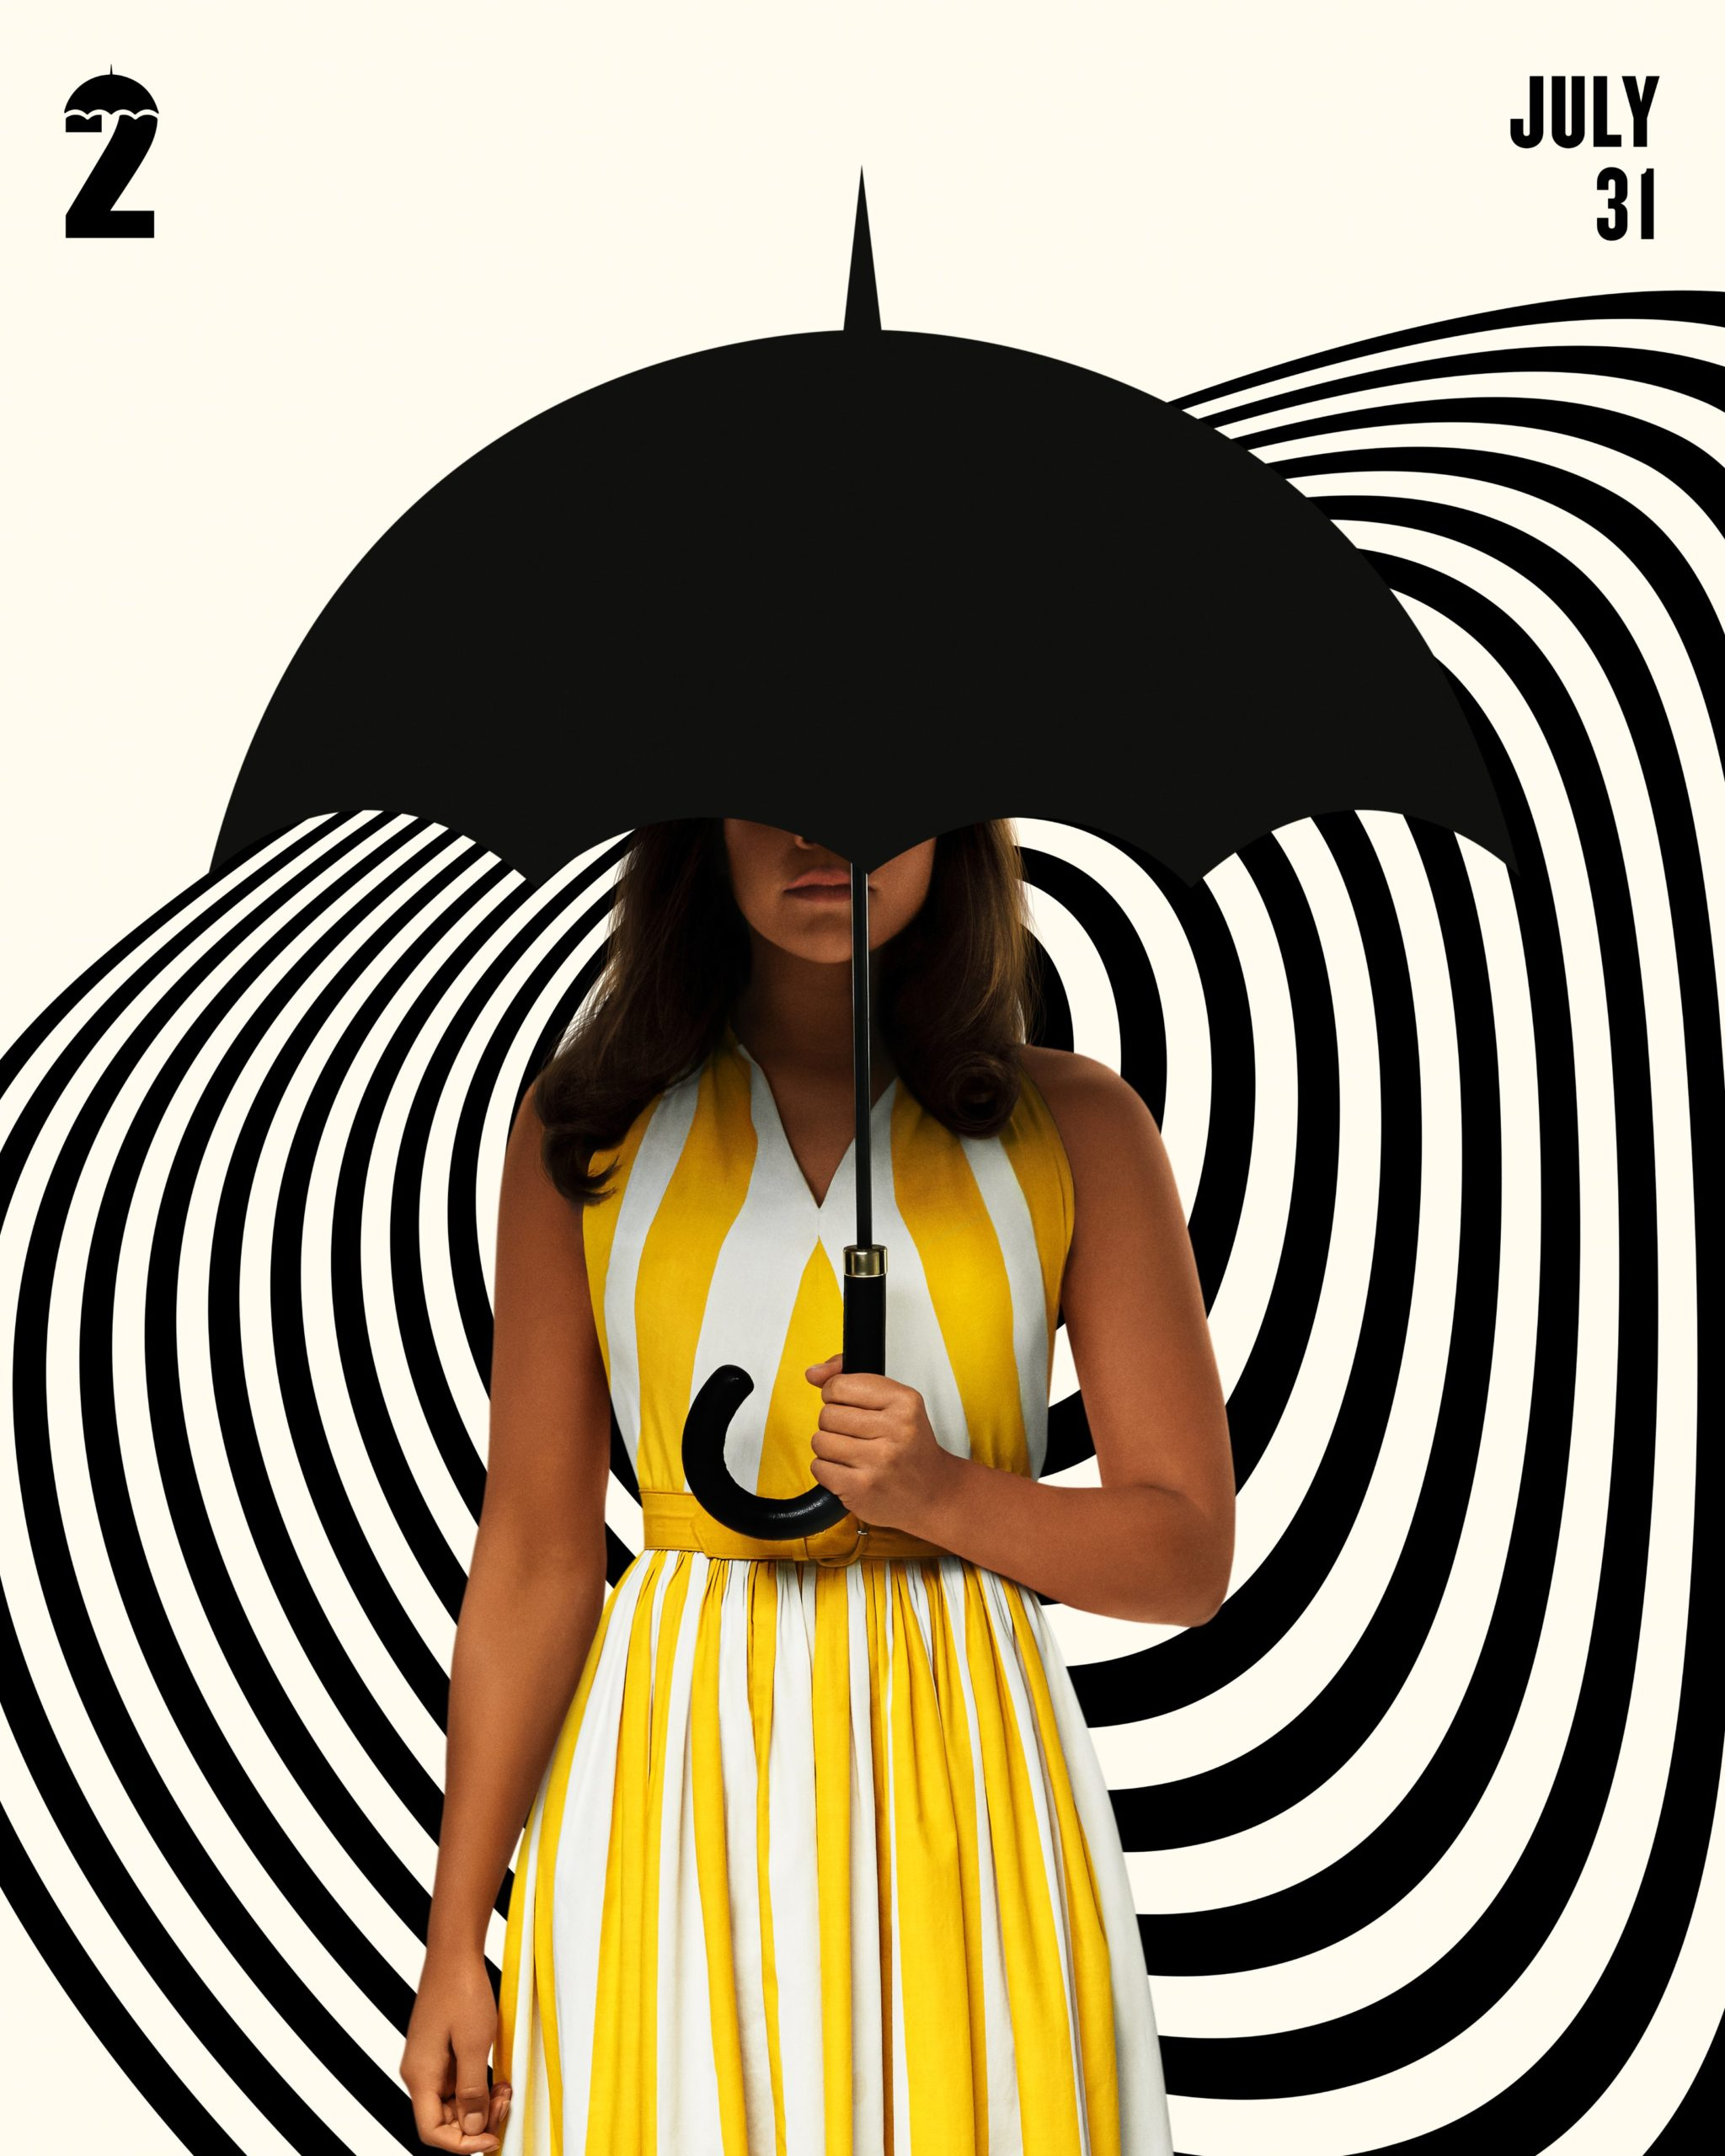 The Umbrella Academy – Allison